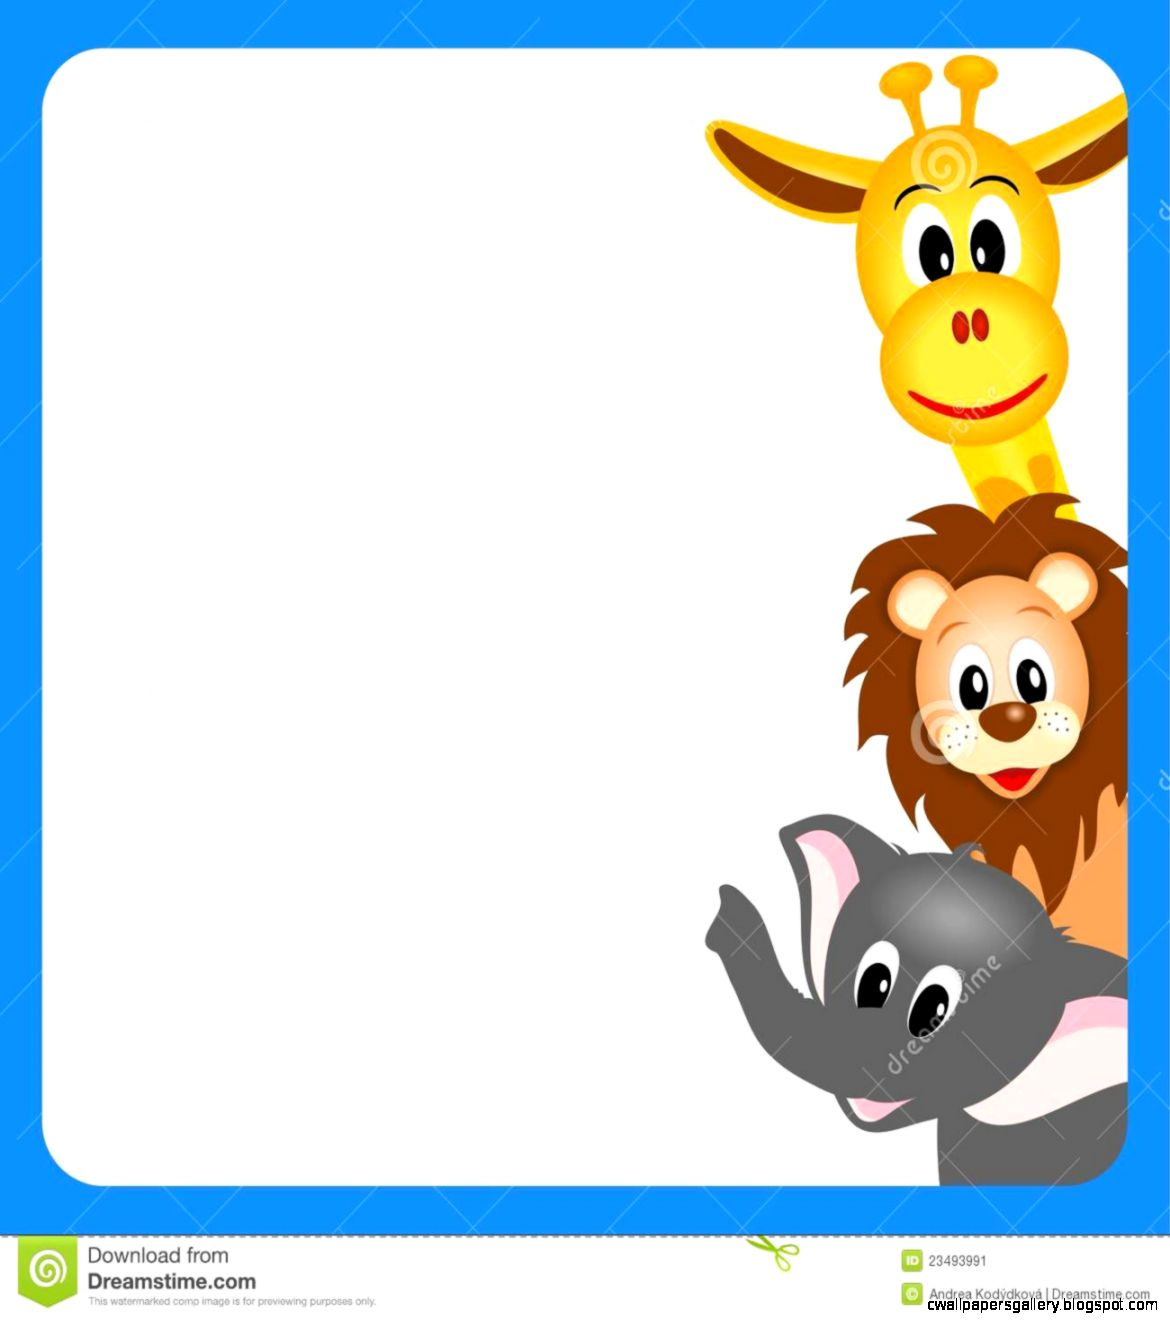 Clip Art Border Downloads